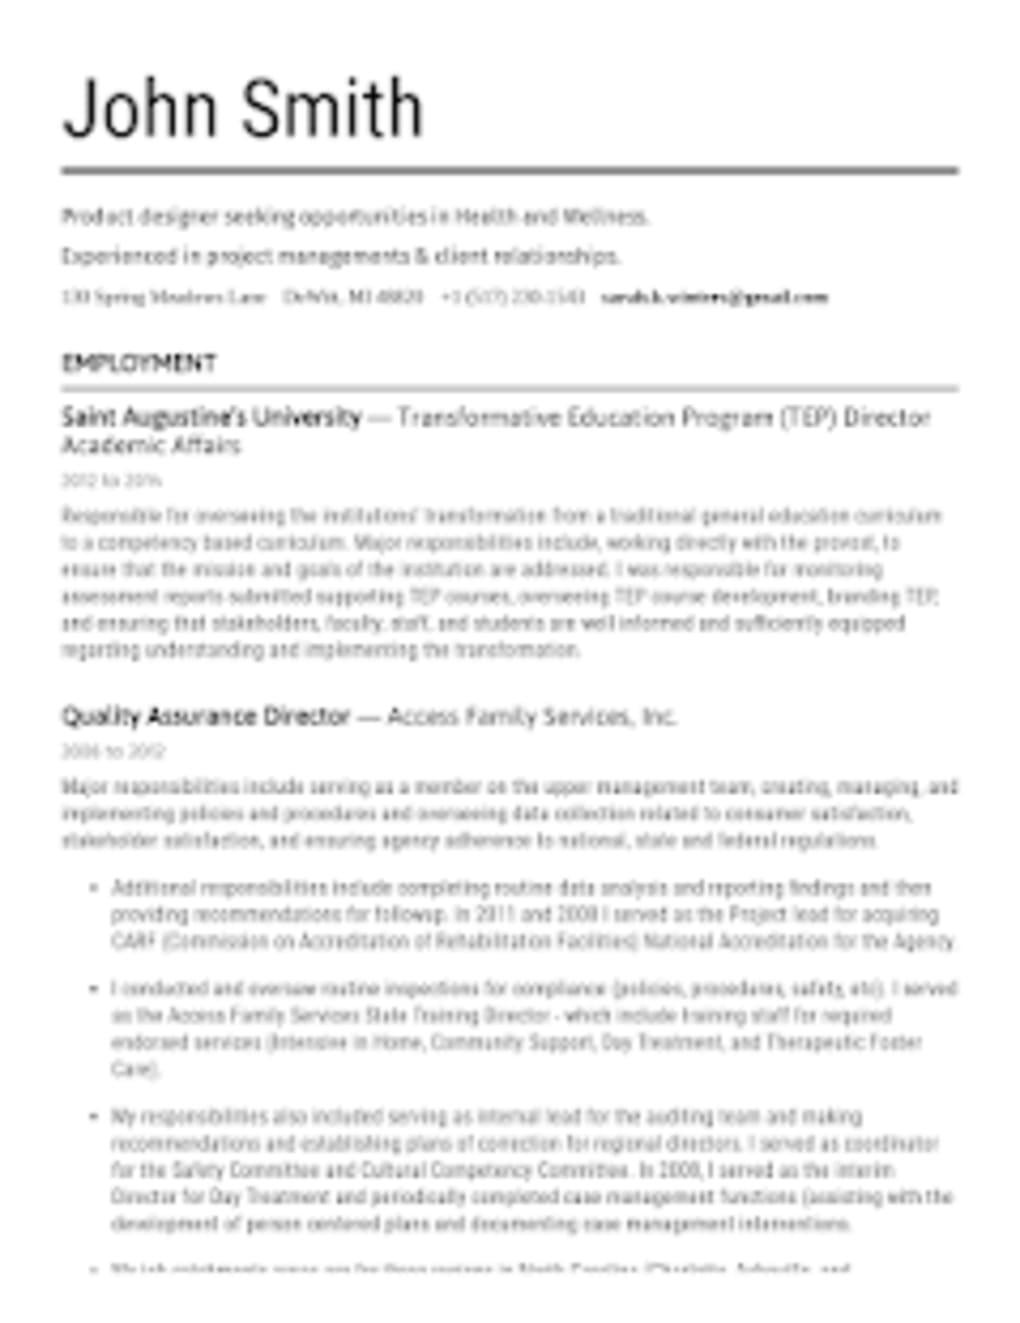 Resume Builder App Free - PDF Templates CV Maker for Android ...